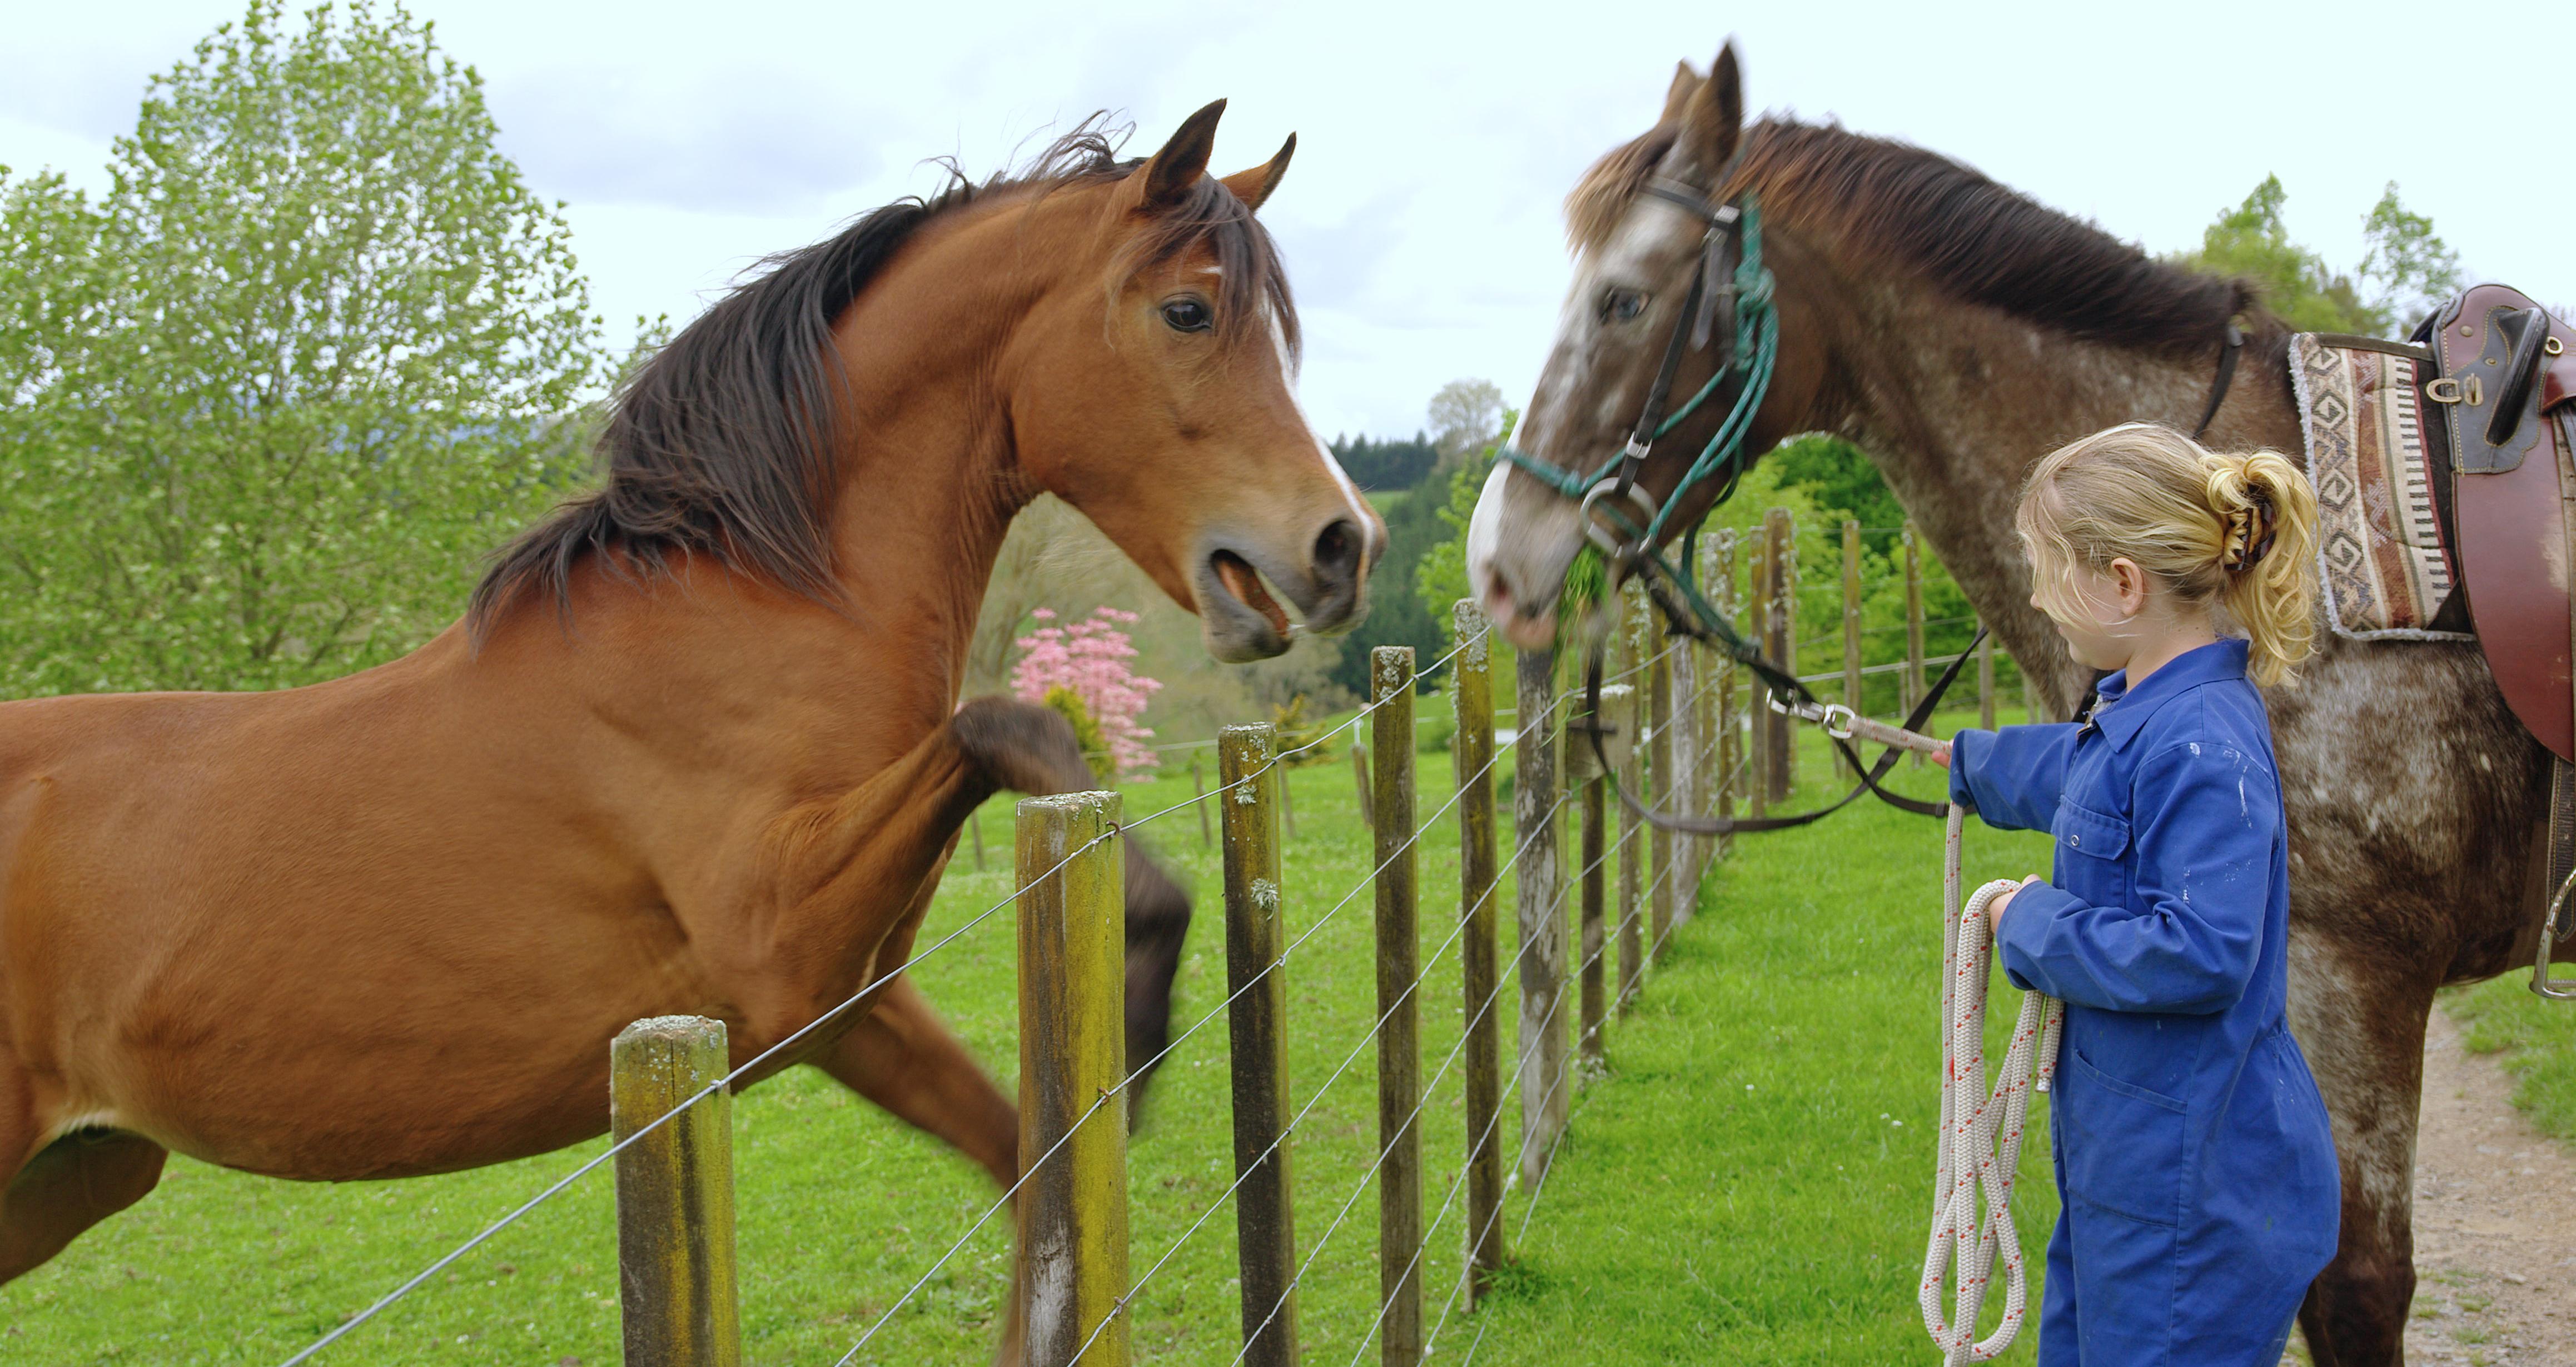 File:Stallion meets Appalossa Mare.jpg - Wikimedia Commons